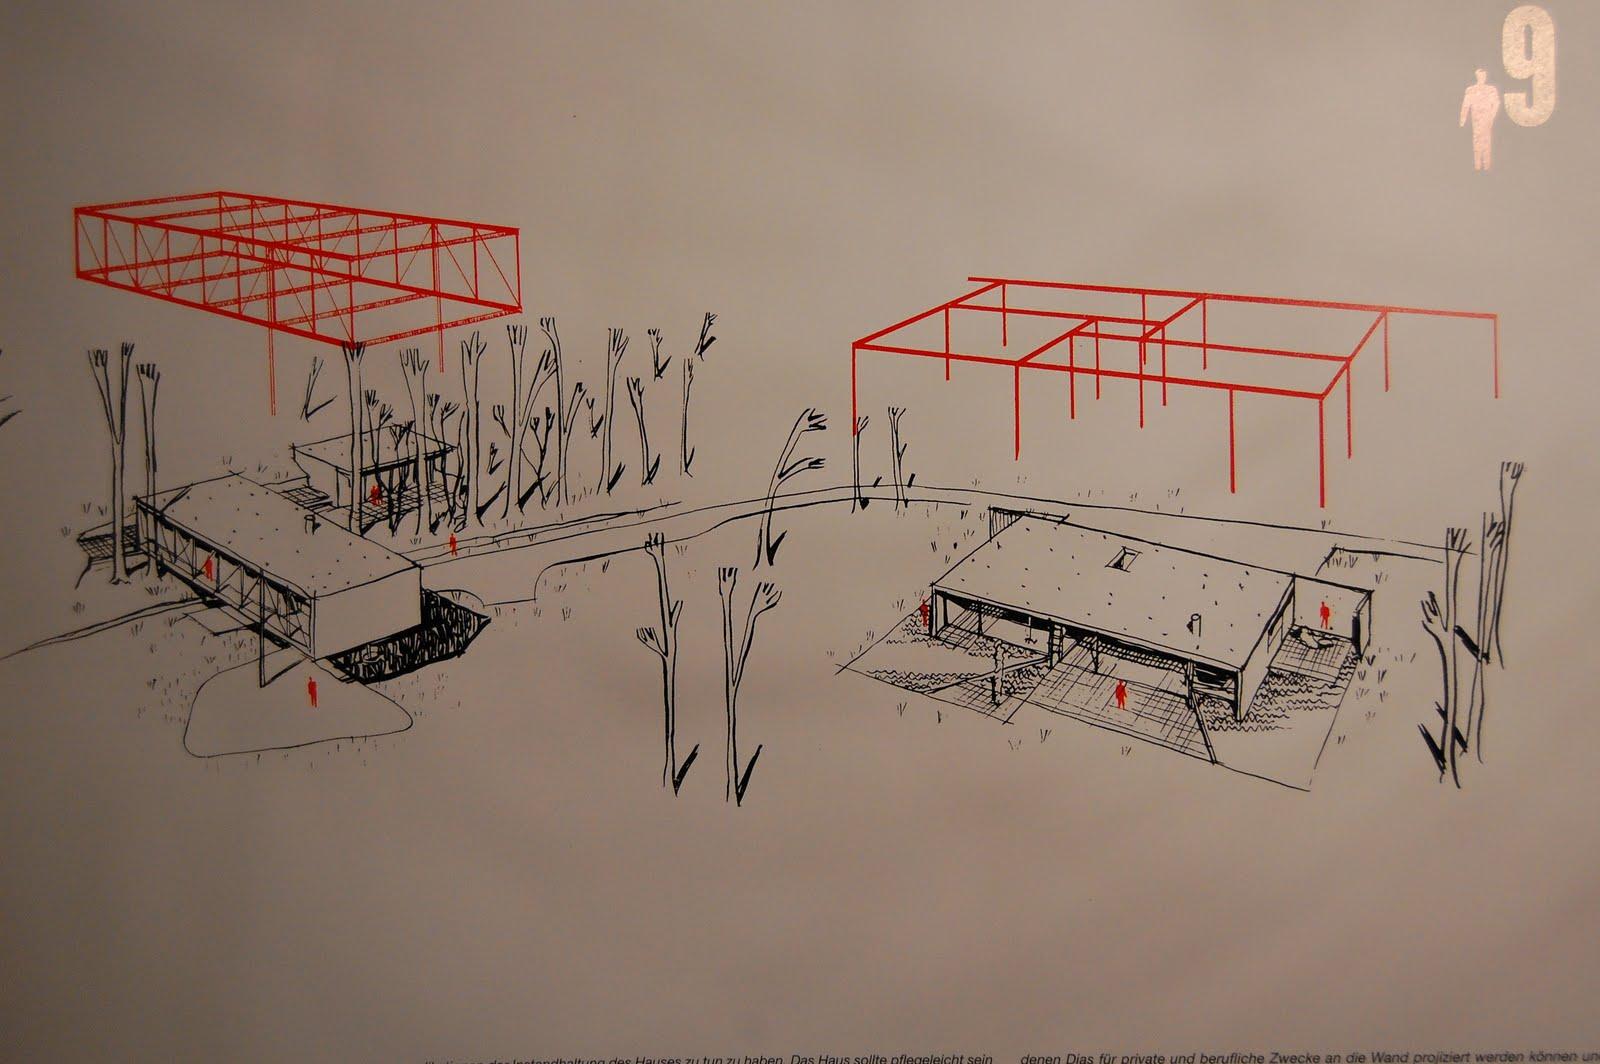 Arquitectura 1 agg dibujo esquicio - Agg arquitectura ...